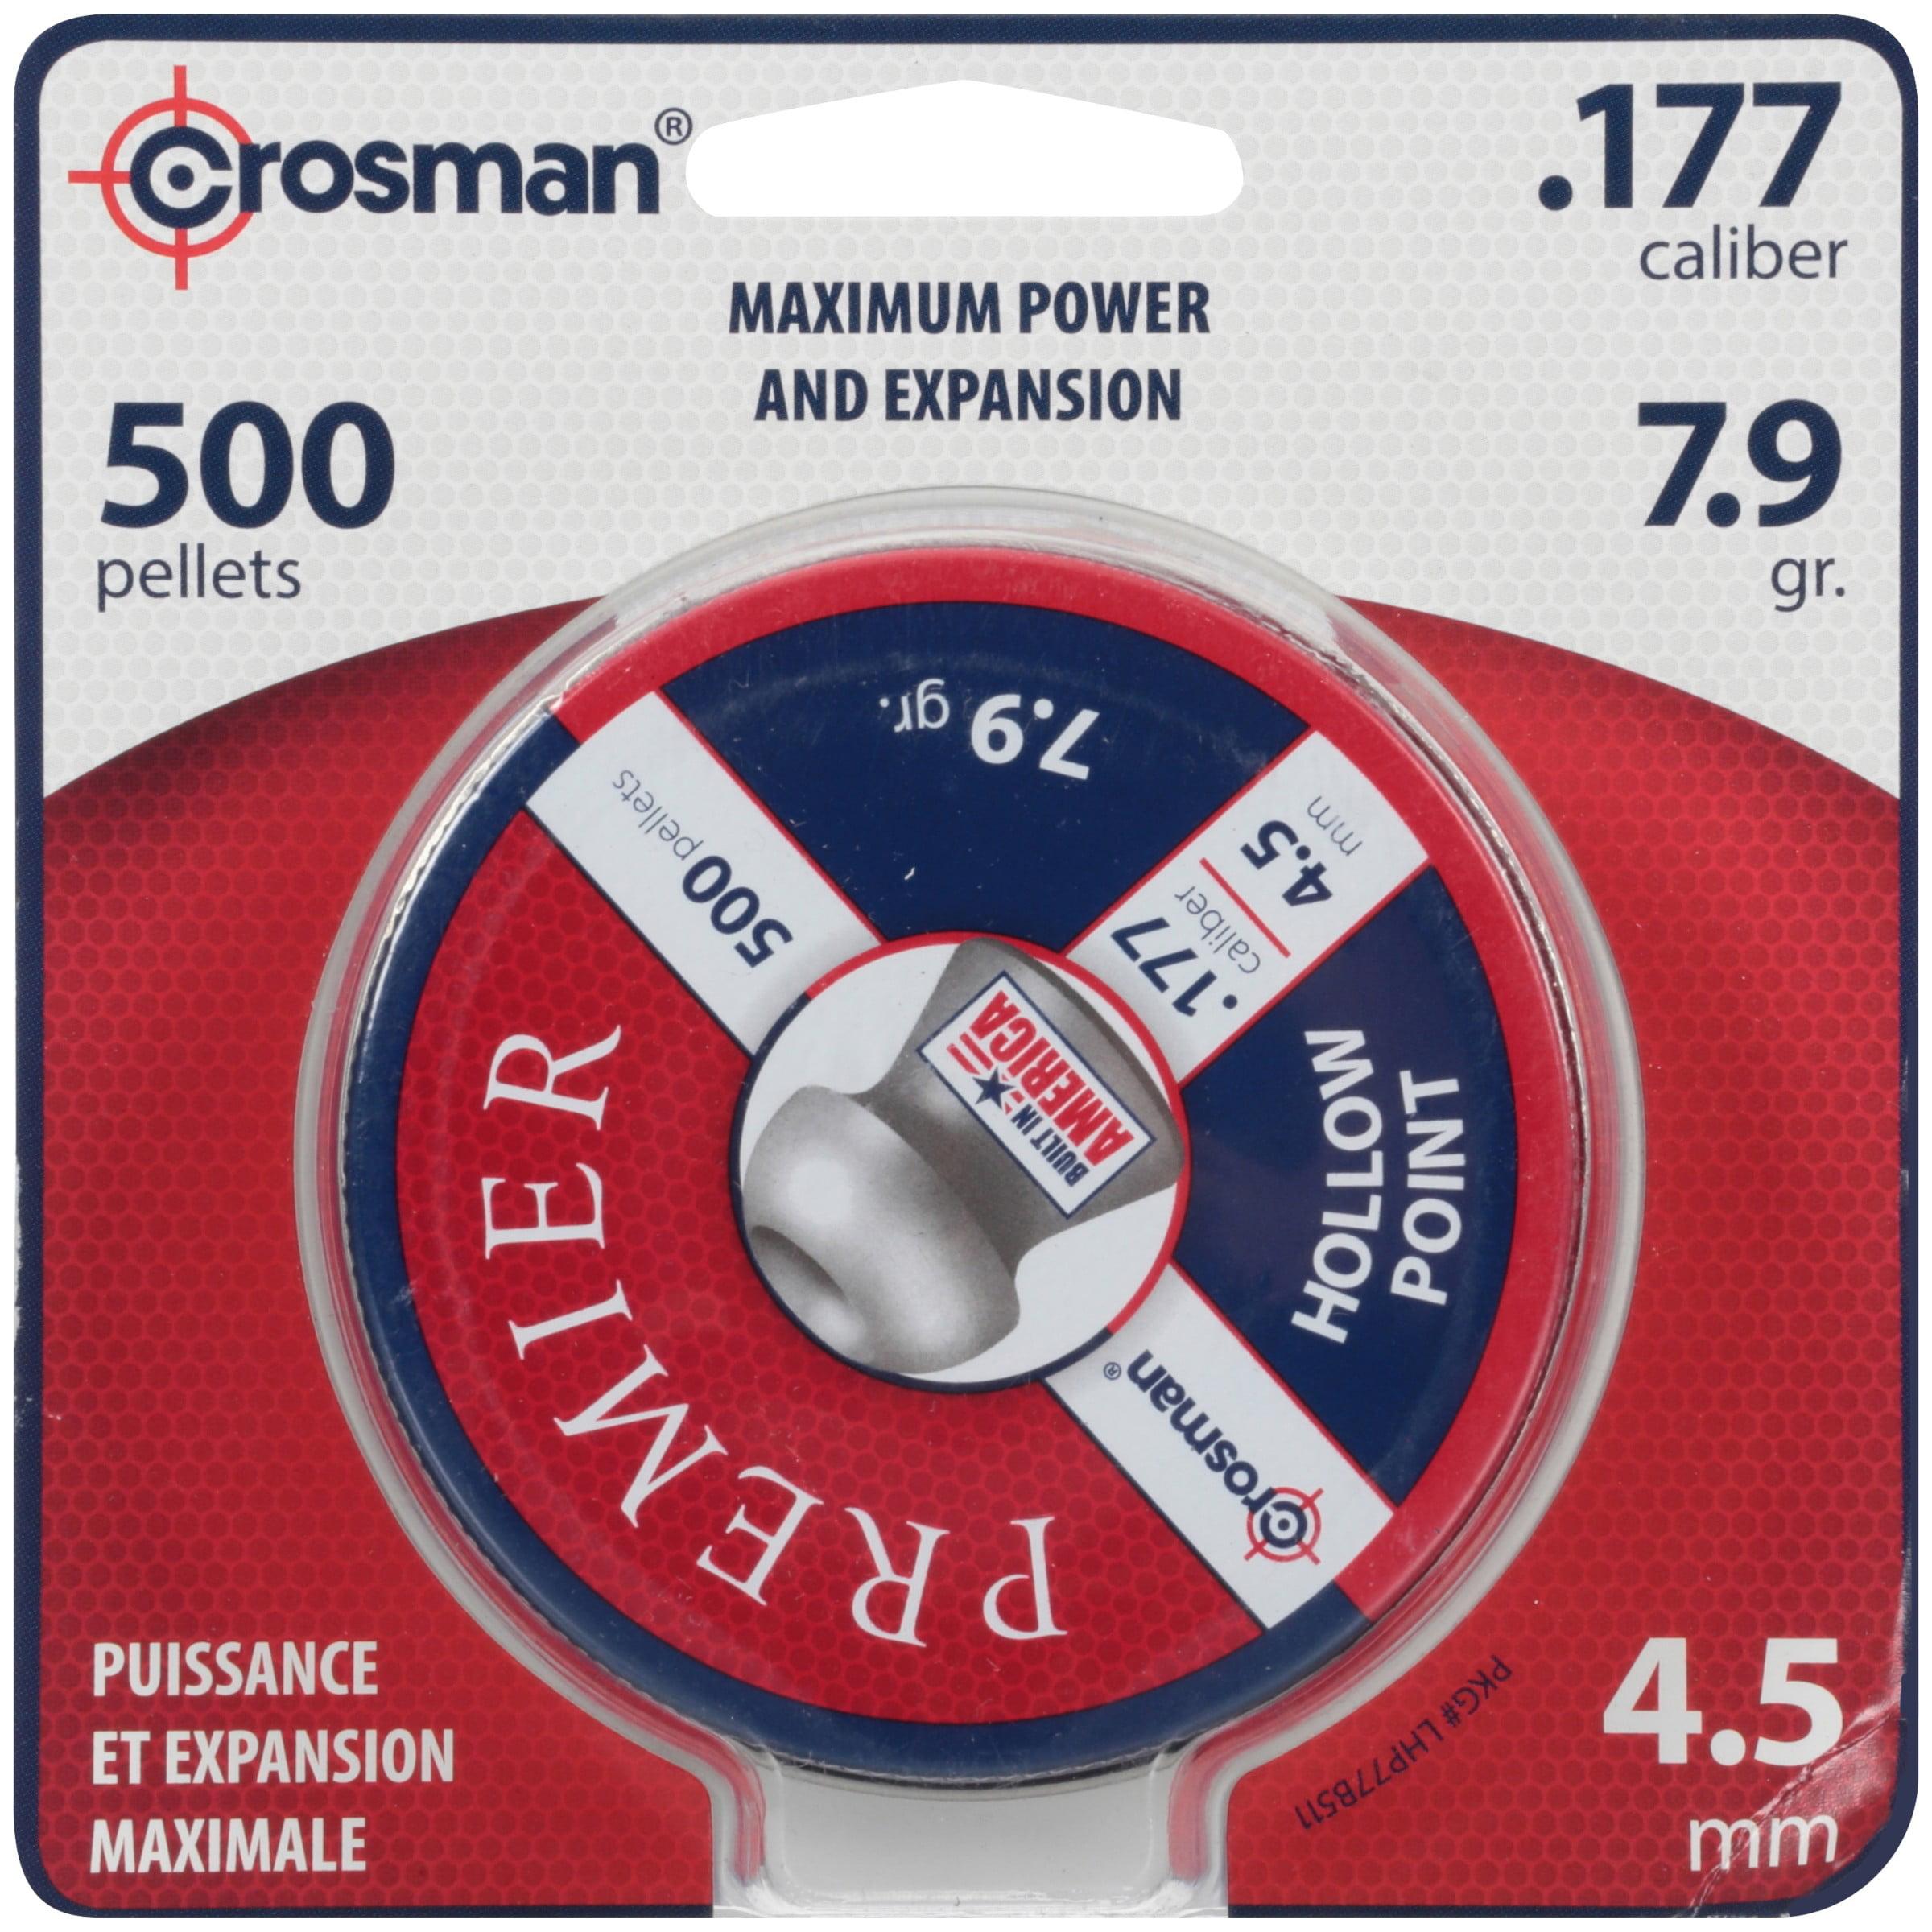 Crosman Premier 177 Caliber Hollow Point Pellets 500ct LHP77 by Crosman